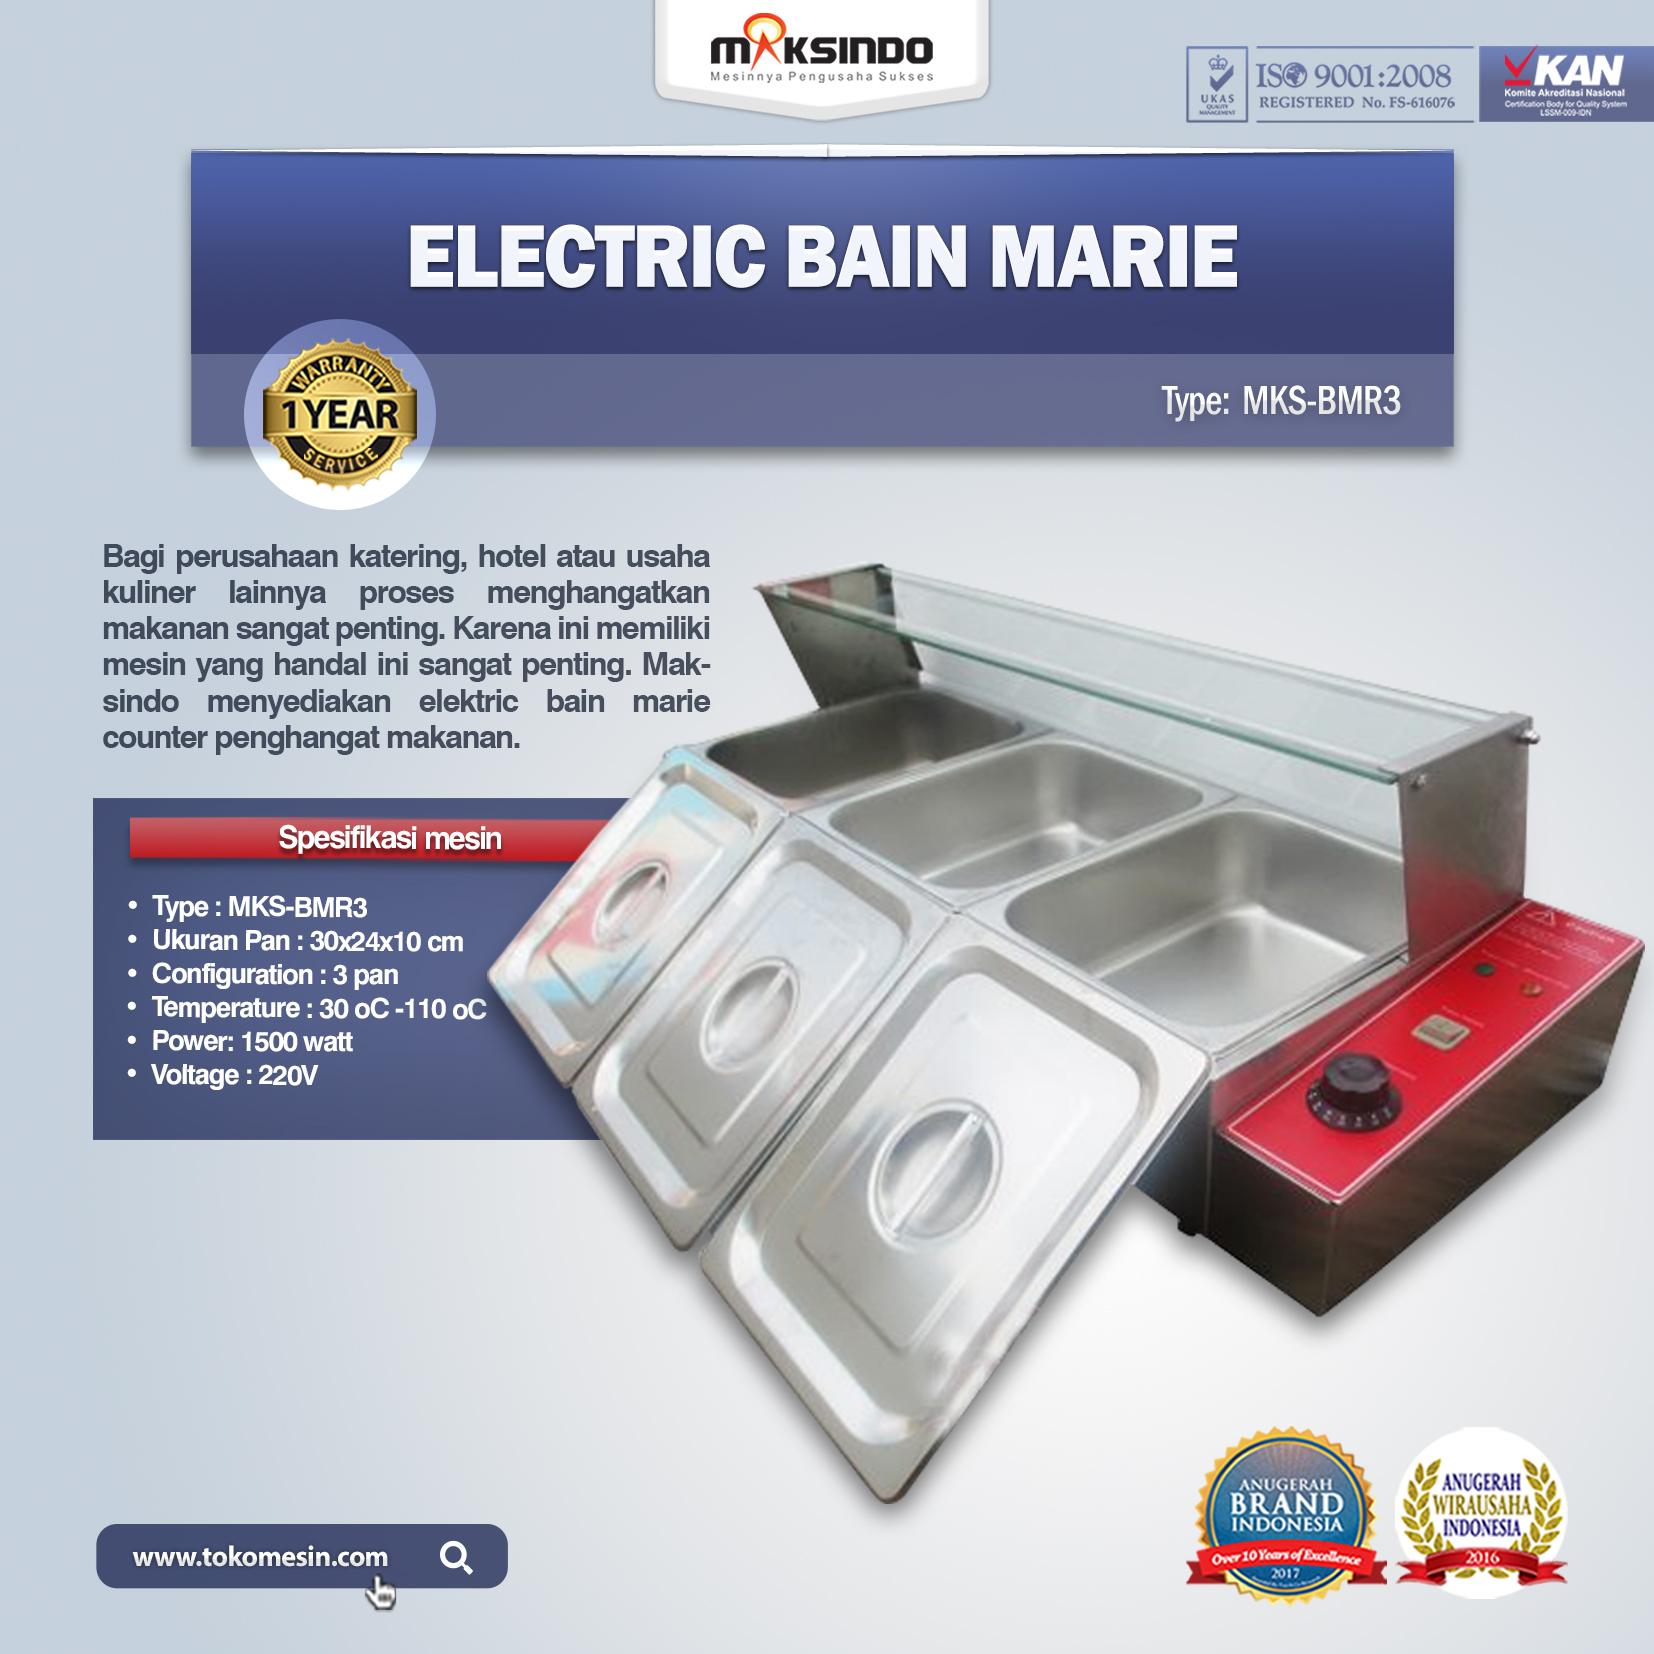 Electric Bain Marie MKS-BMR3